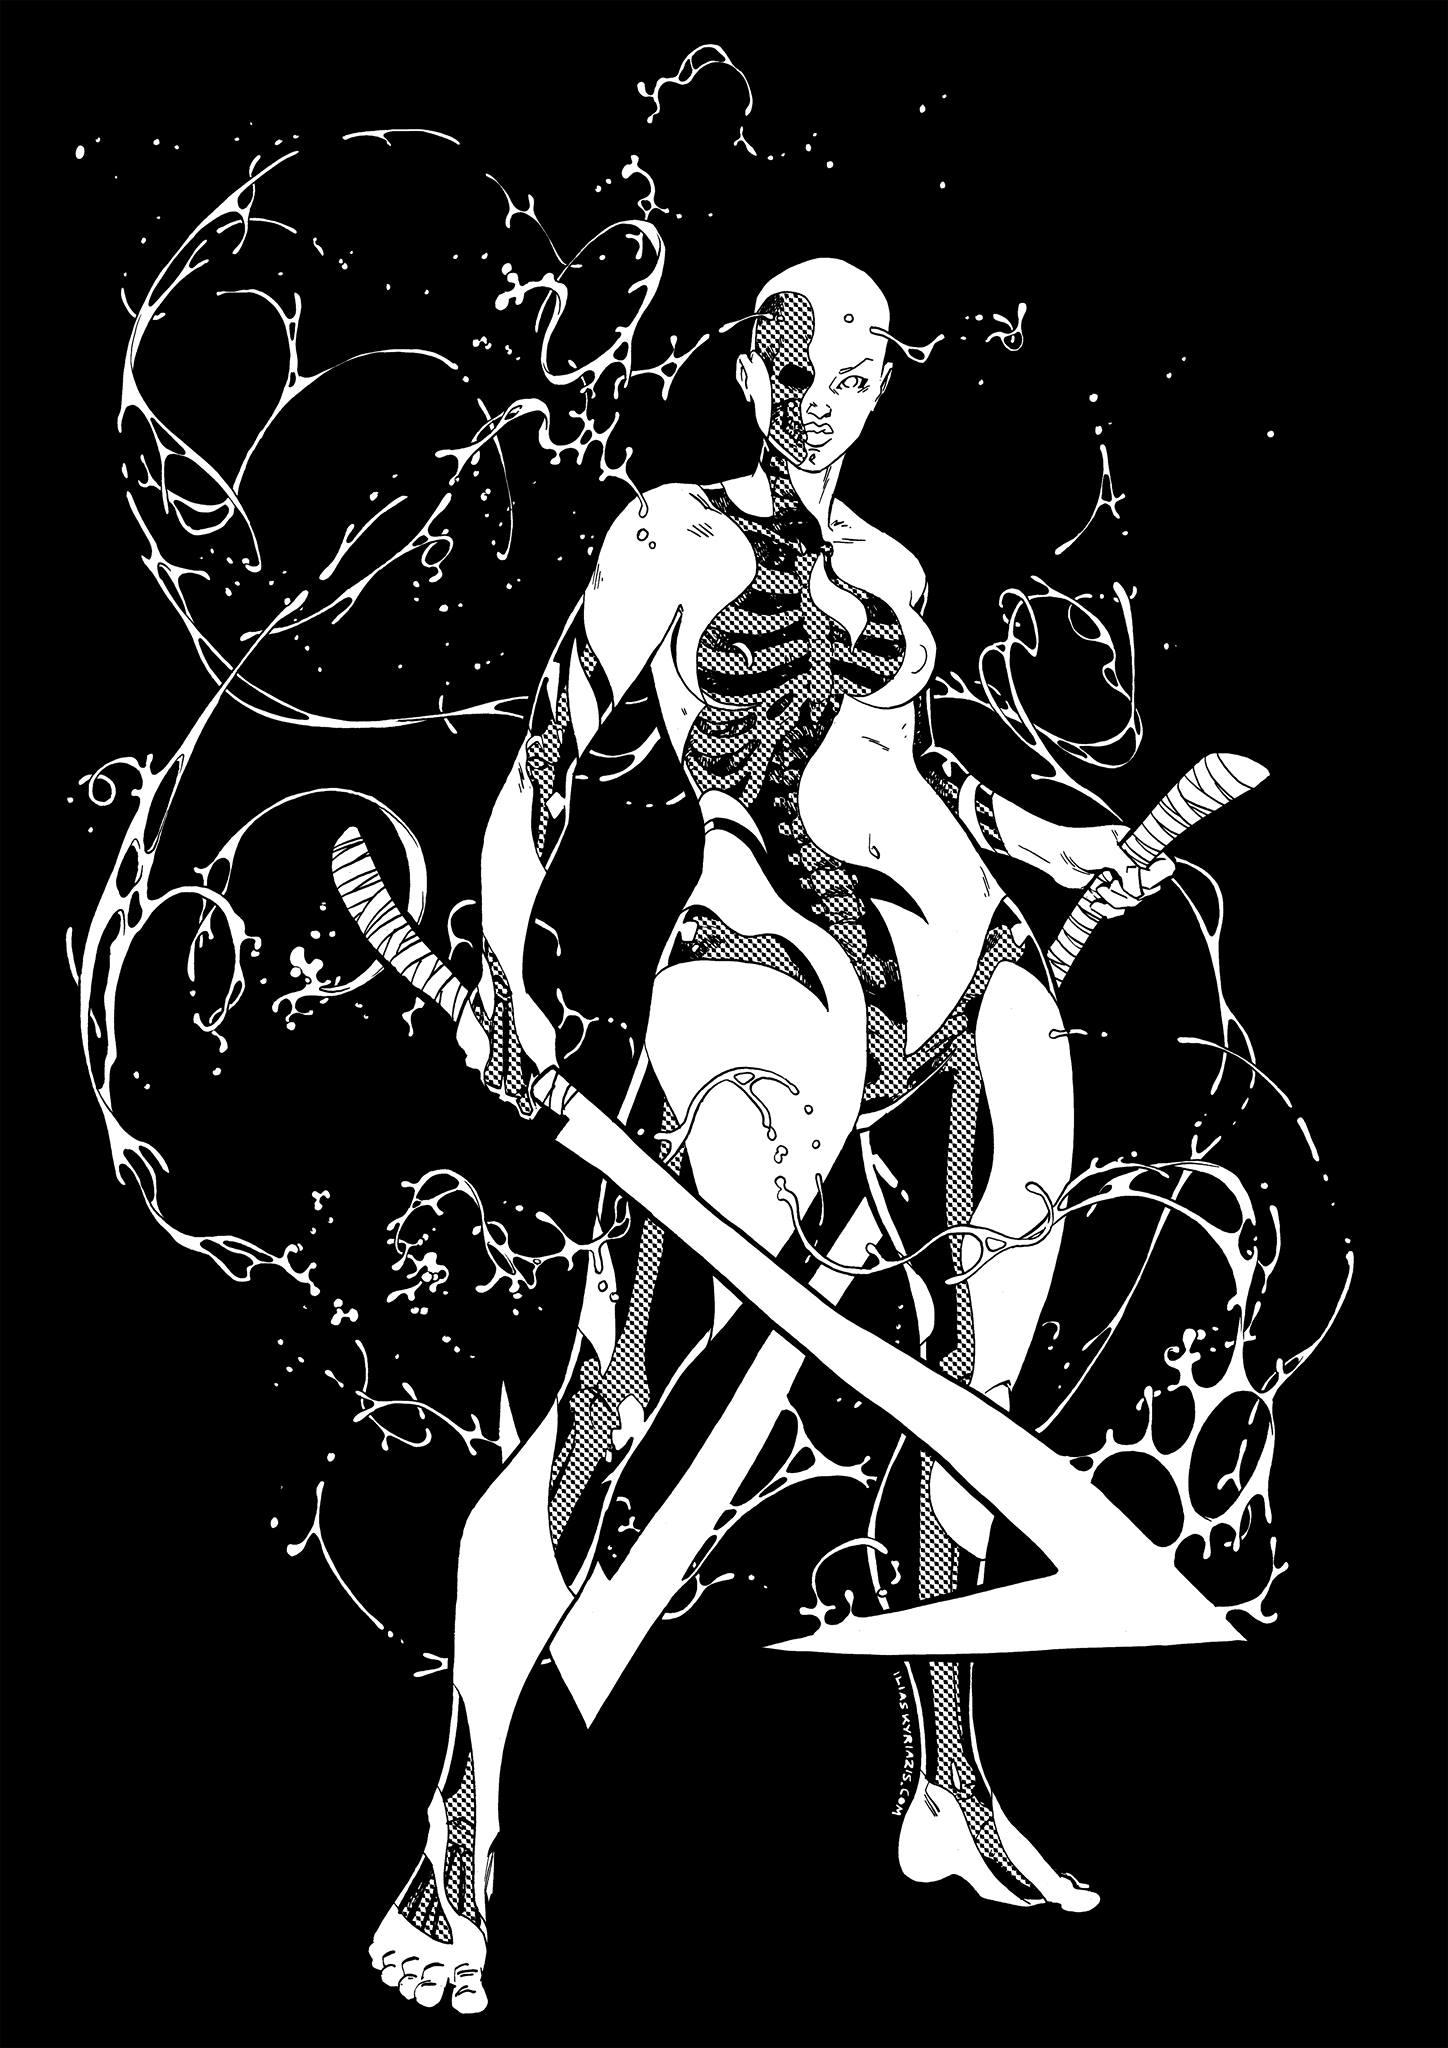 Skeletal t-shirt by iliaskrzs